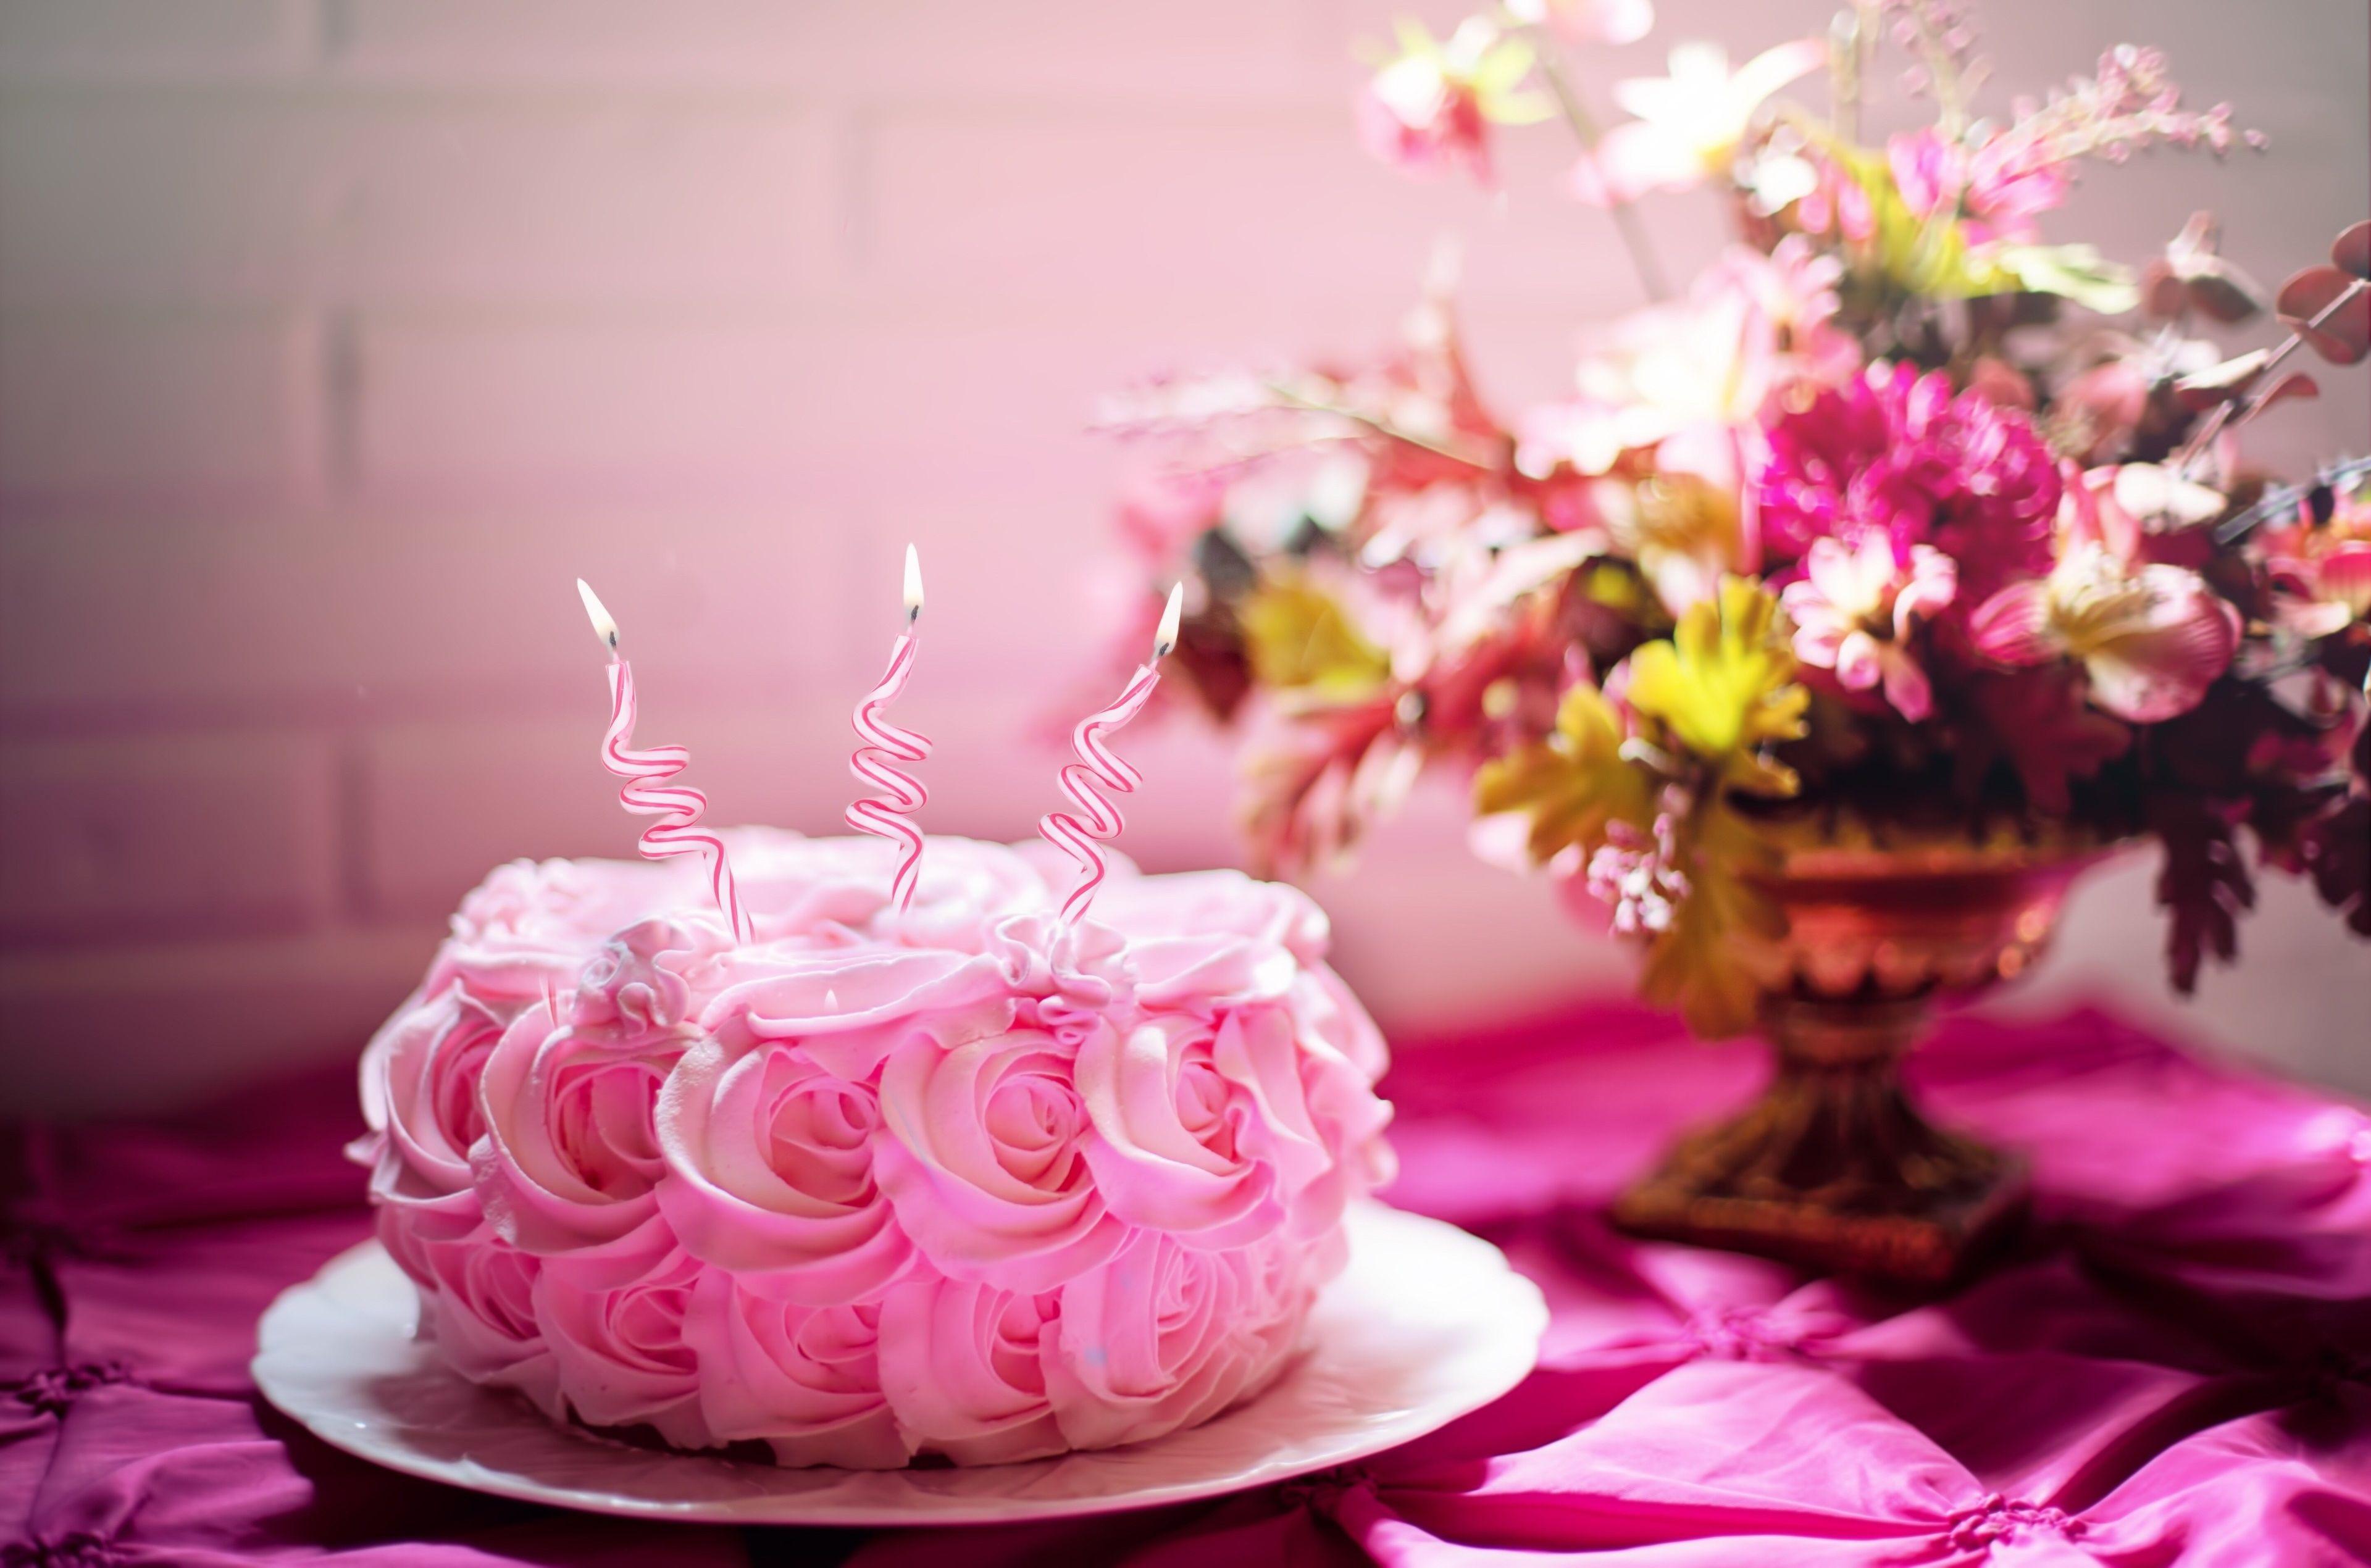 3840x2540 Birthday Cake 4k New Wallpapers Full Hd Valentine Wishes Happy Birthday Cakes Cake